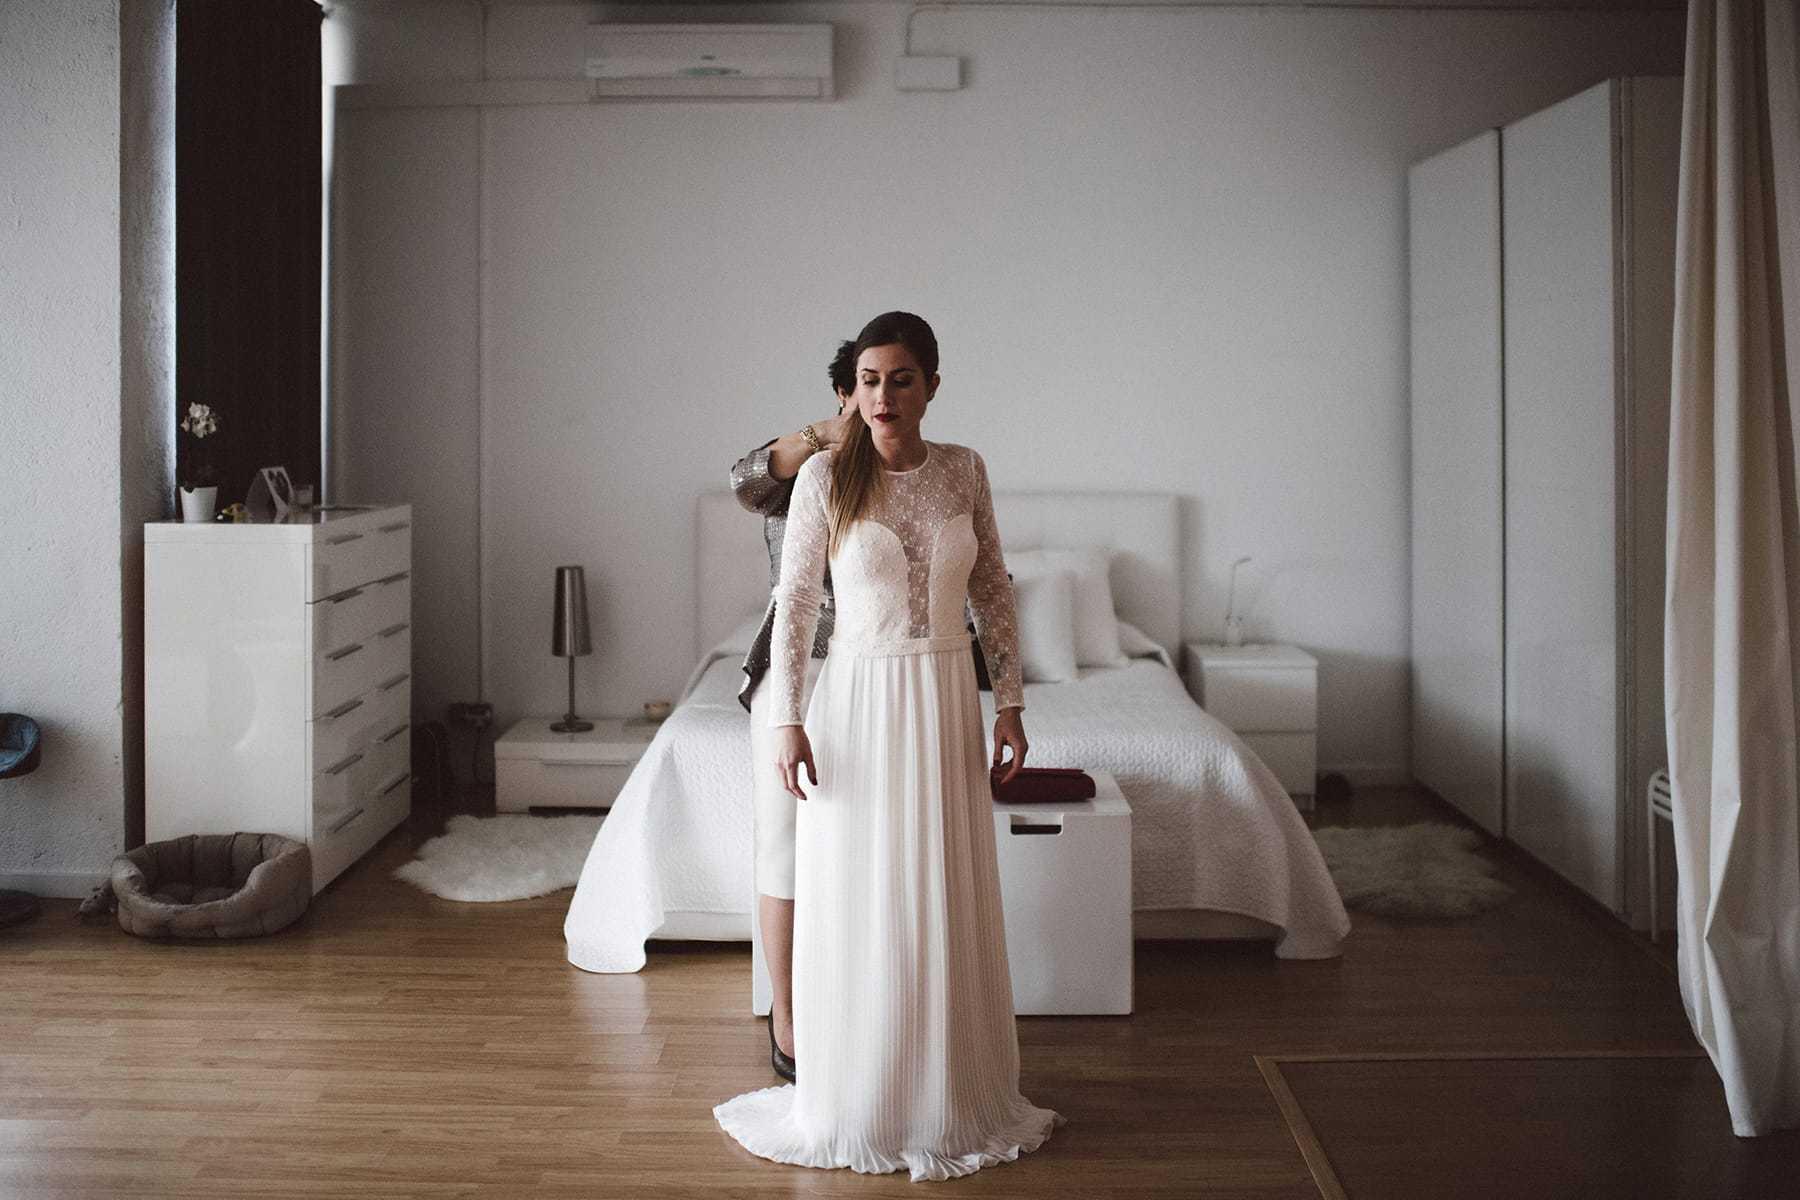 vestido_de_novia_otaduy_hilario_sanchez_fotografo_boda_barcelona_030